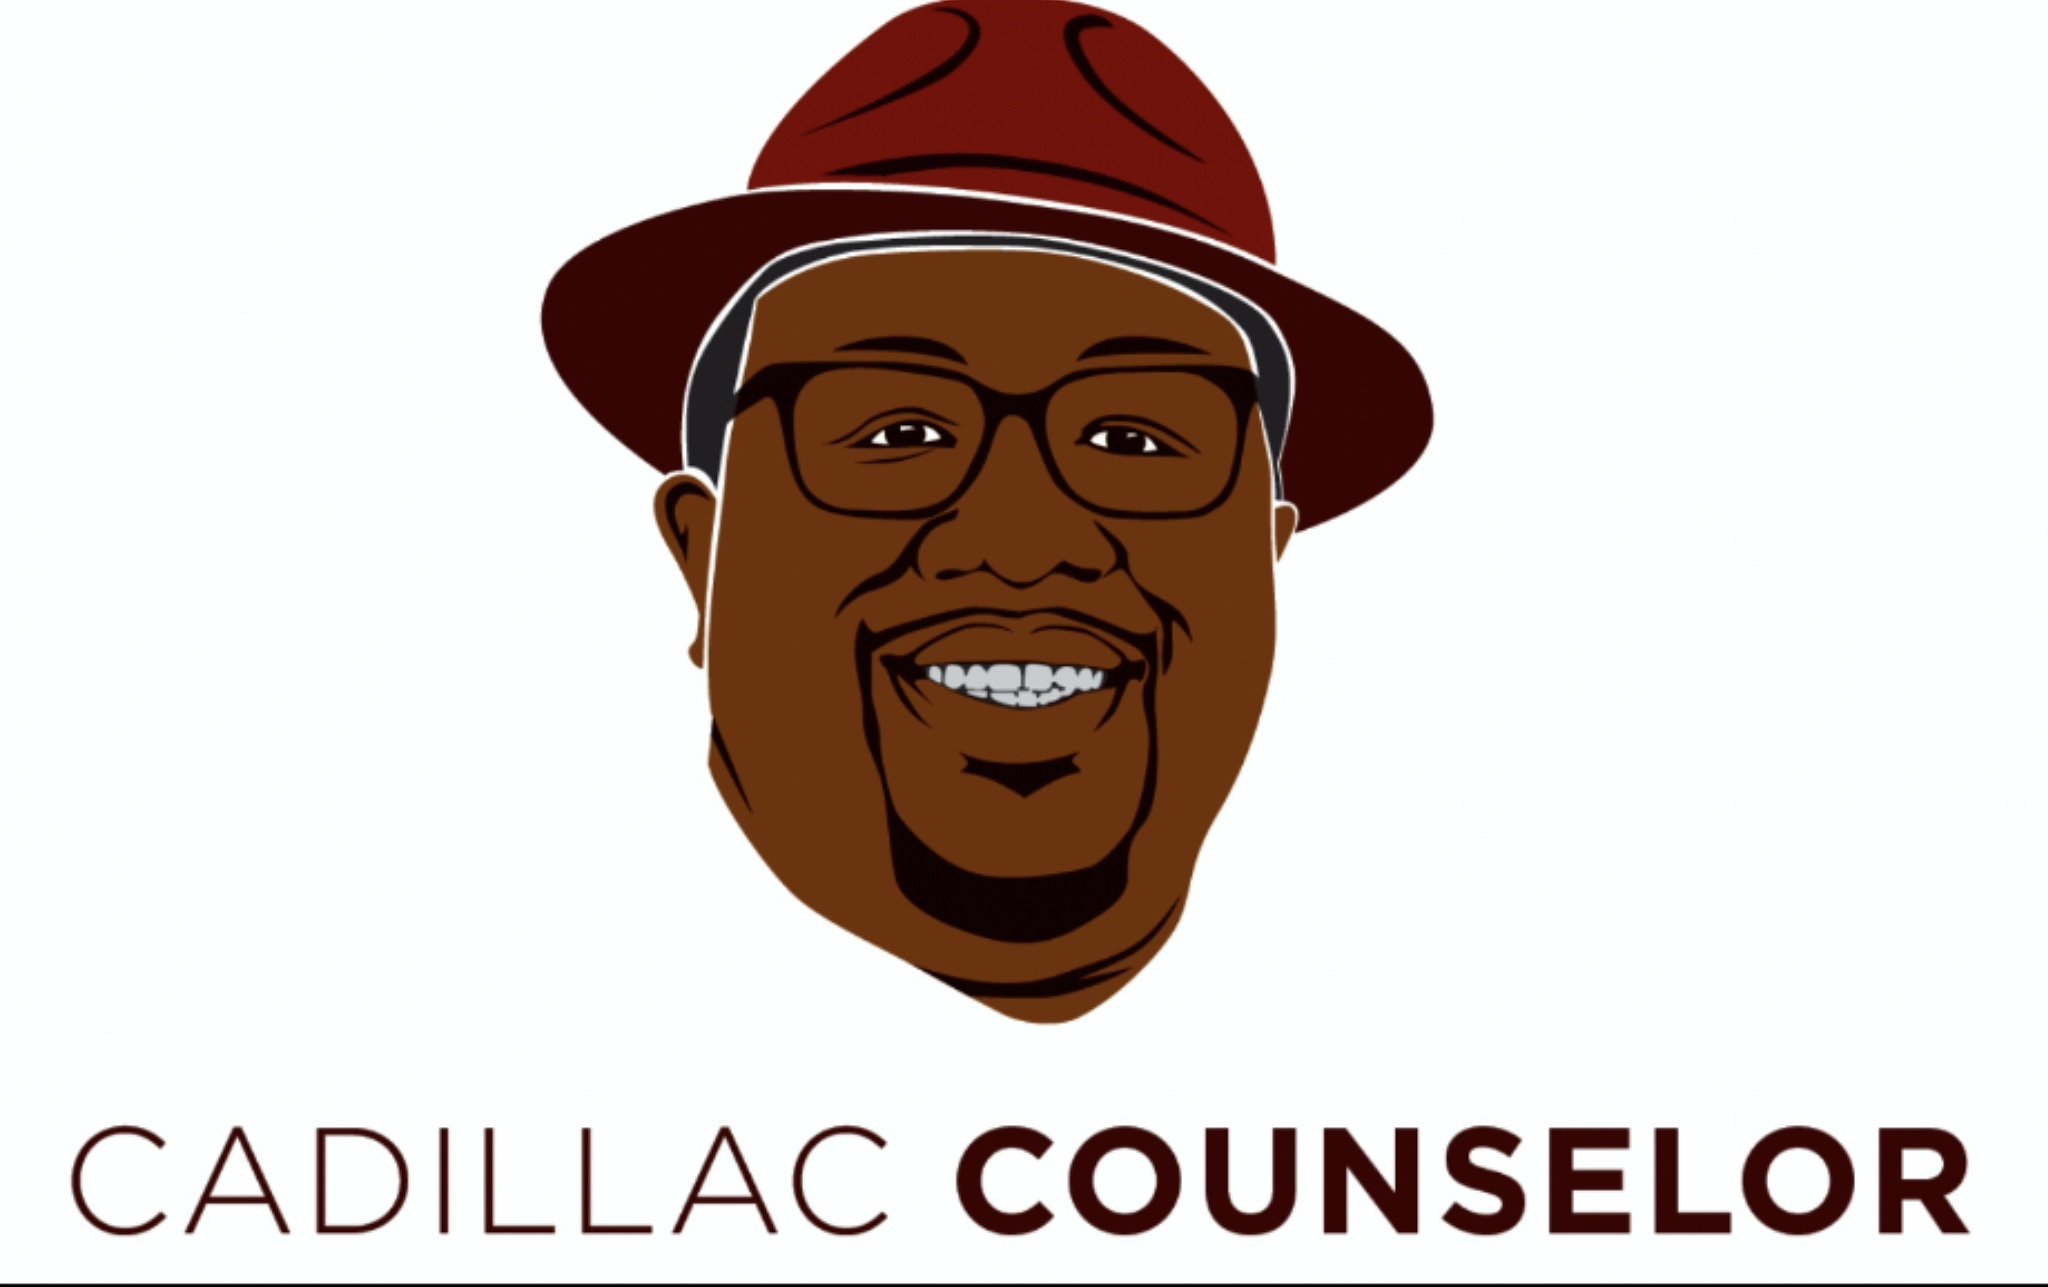 Cadillac Counselor